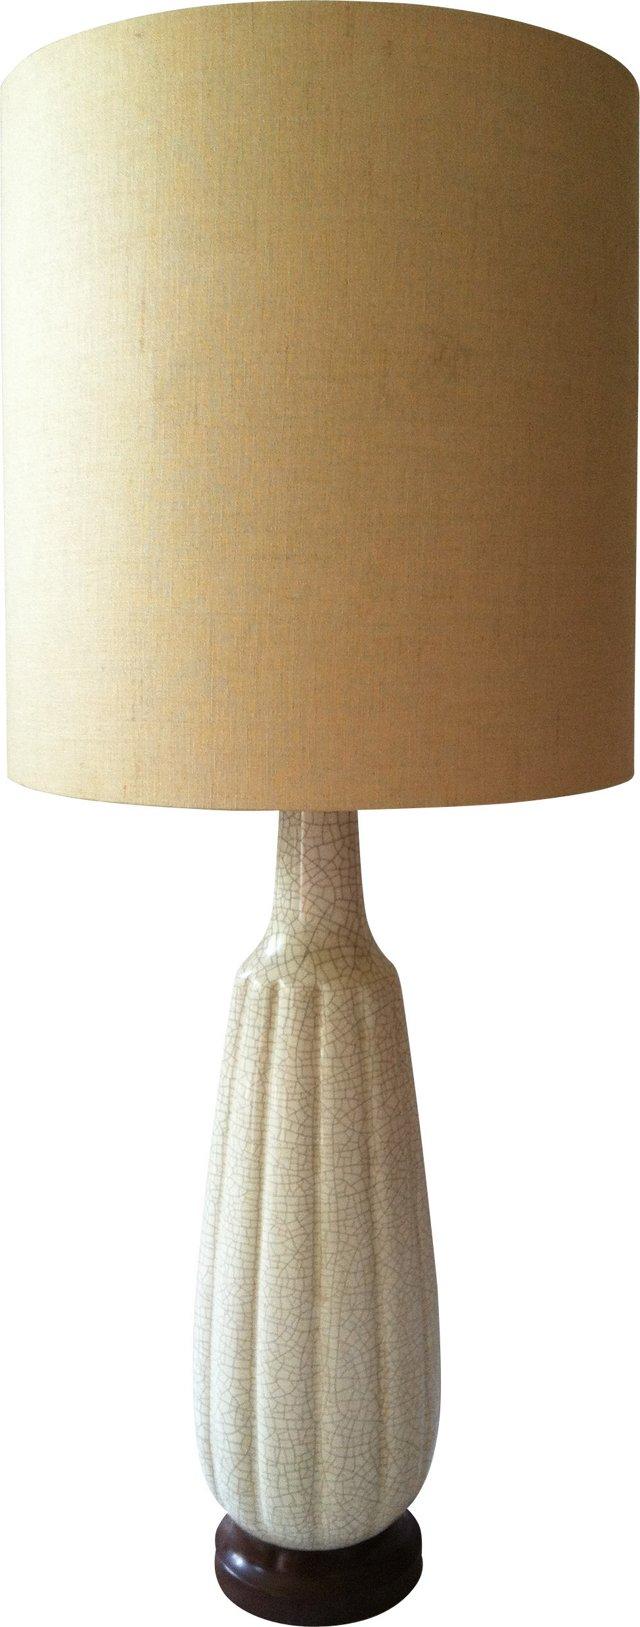 Tall Crackle-Glaze Lamp Base